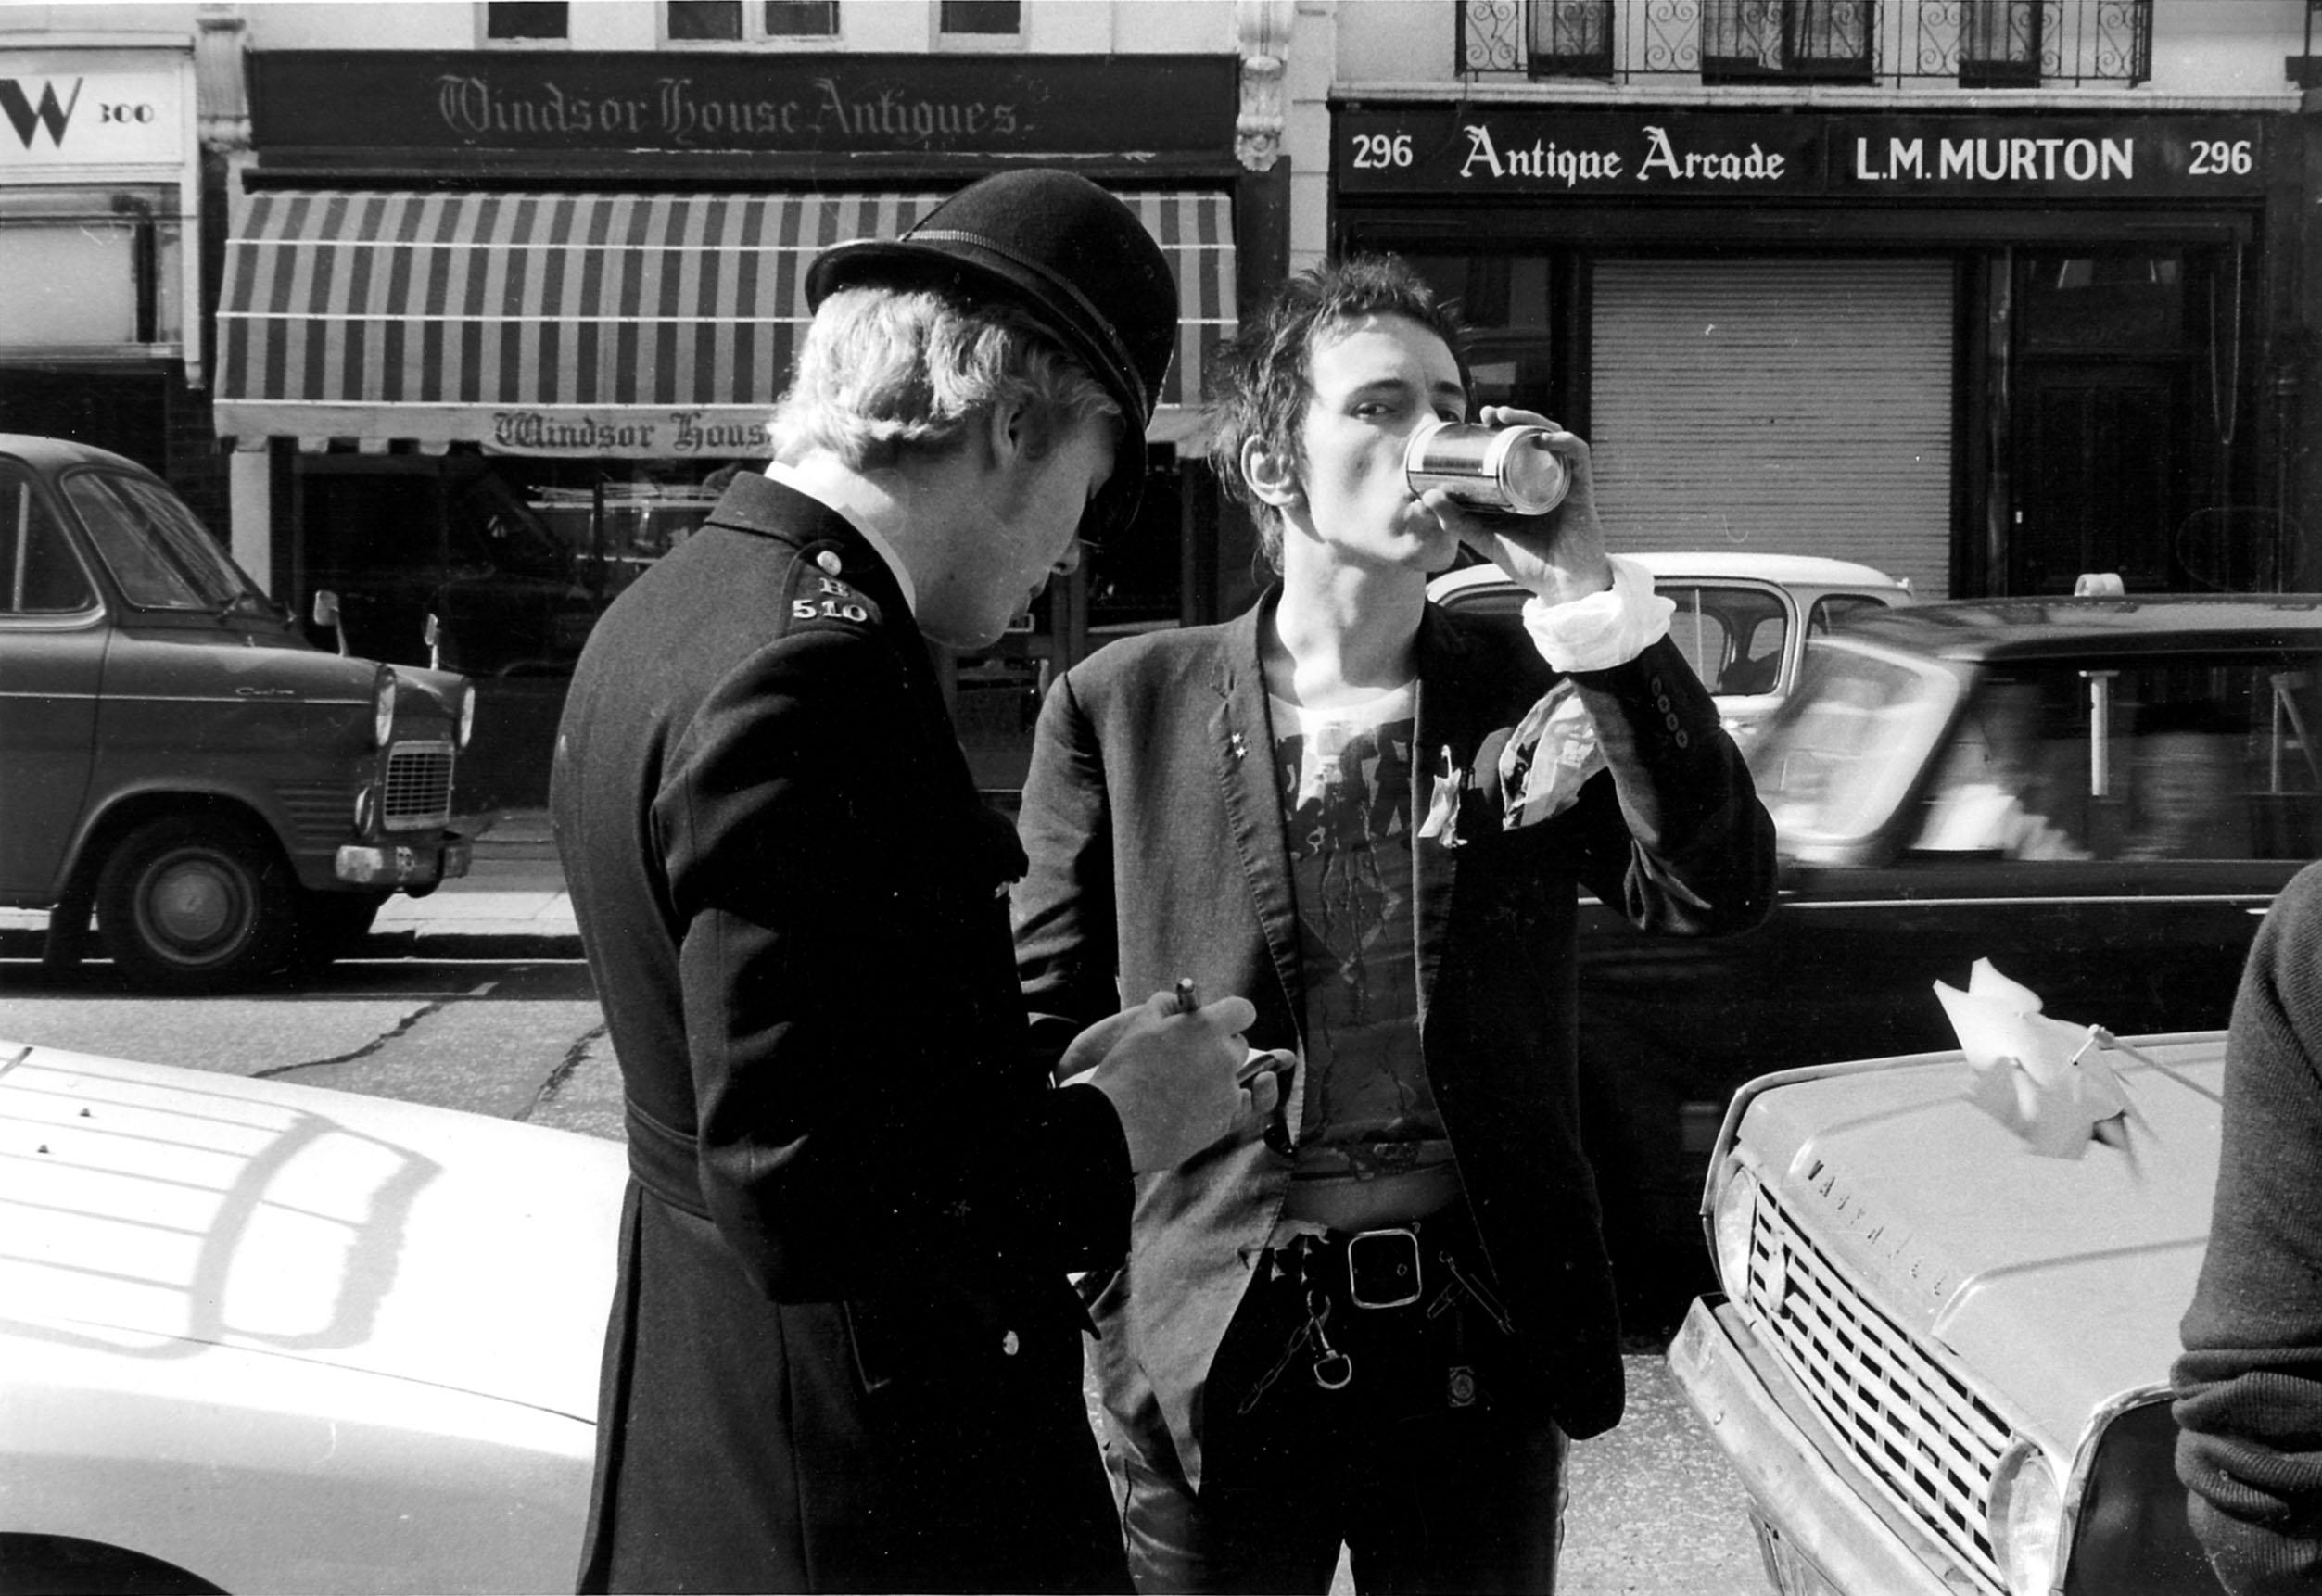 Portobello Road, London 23rd May 1977 © Barry Plummer